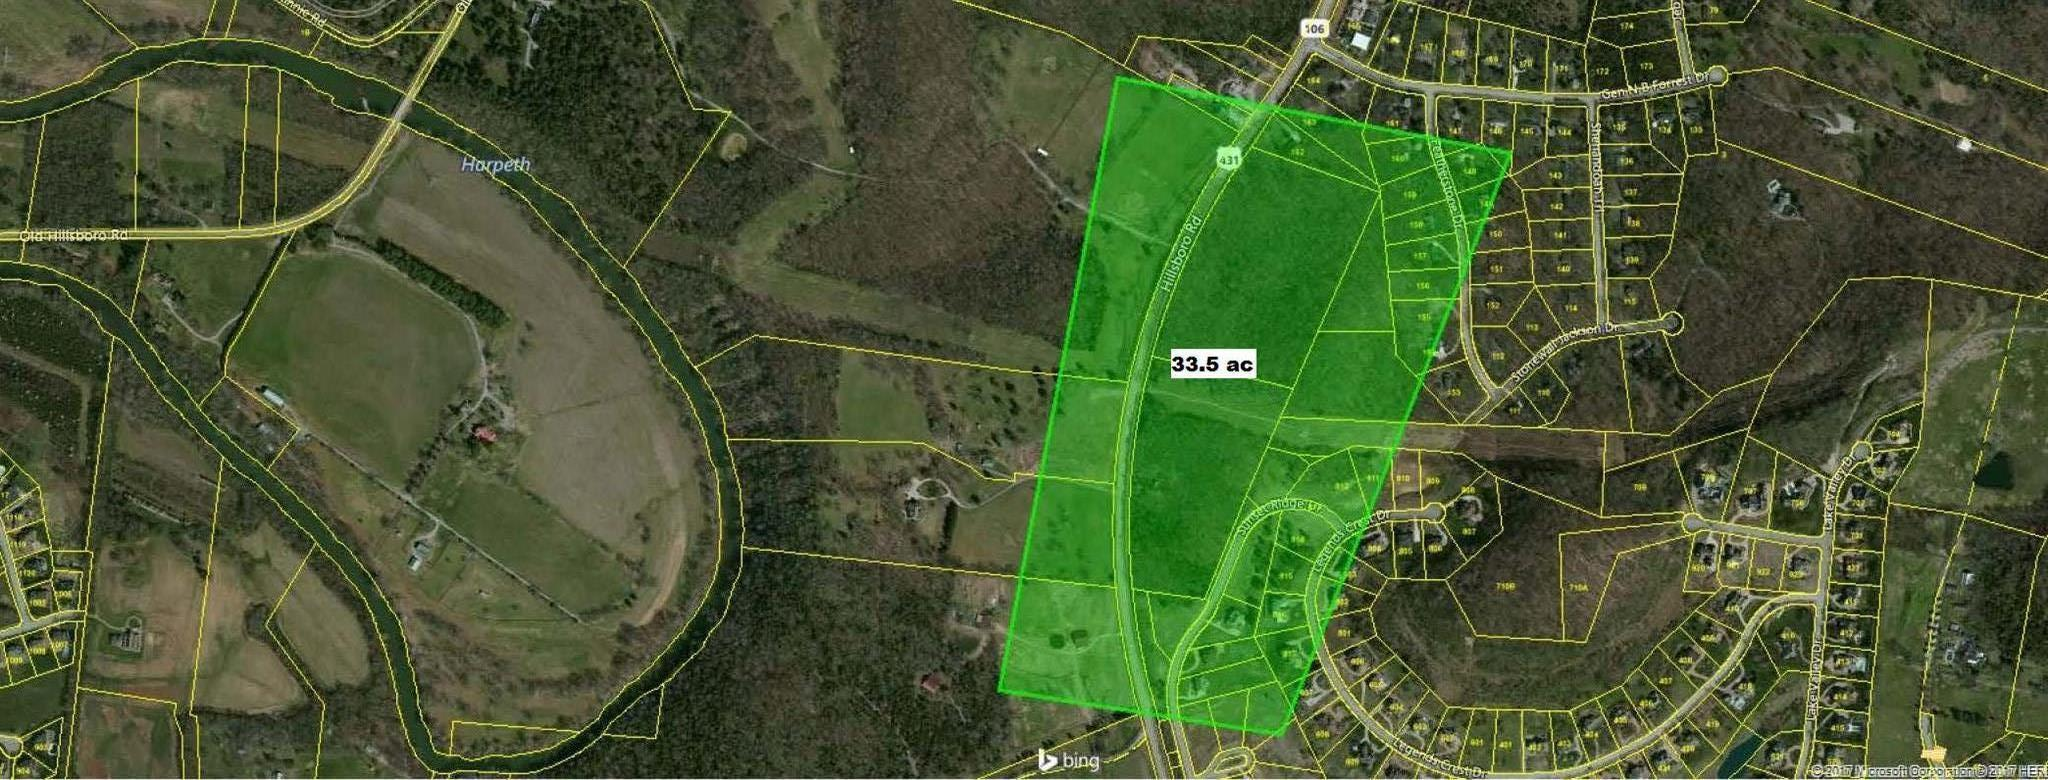 2057 Hillsboro Rd, Franklin, TN 37069 - Franklin, TN real estate listing